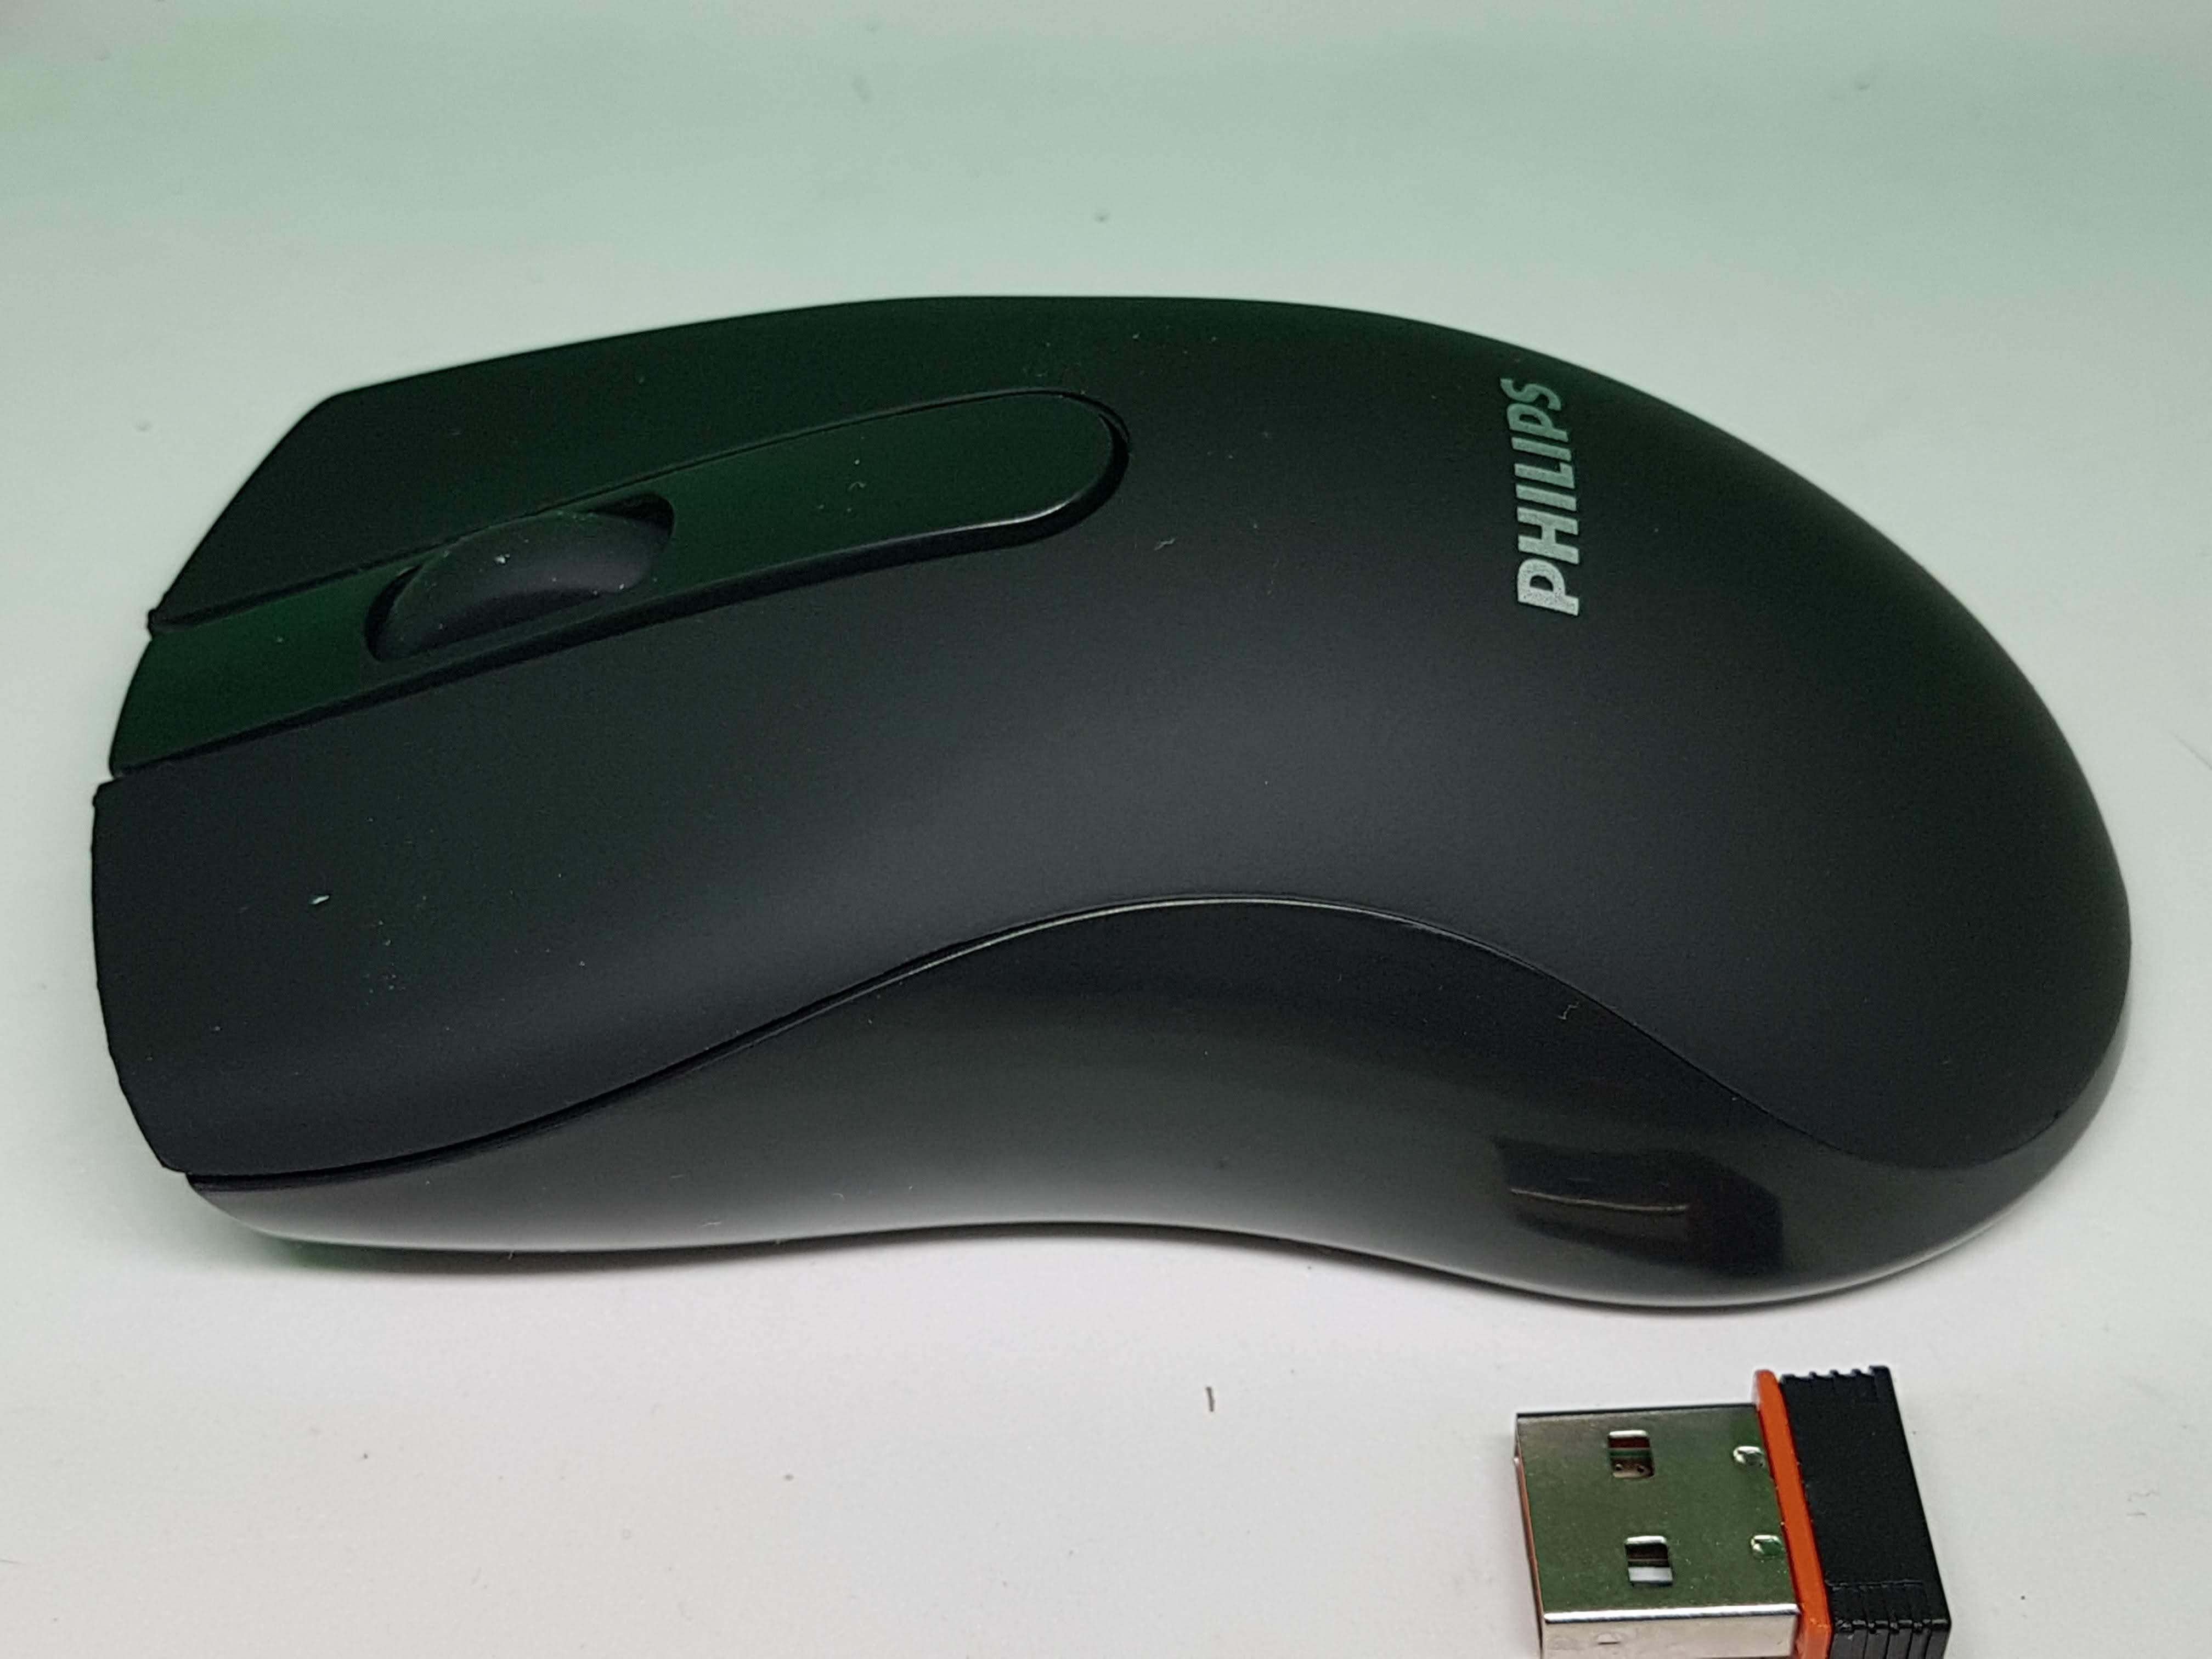 Philips-Souris-M200 - Souris-Philips-M200-6.jpg